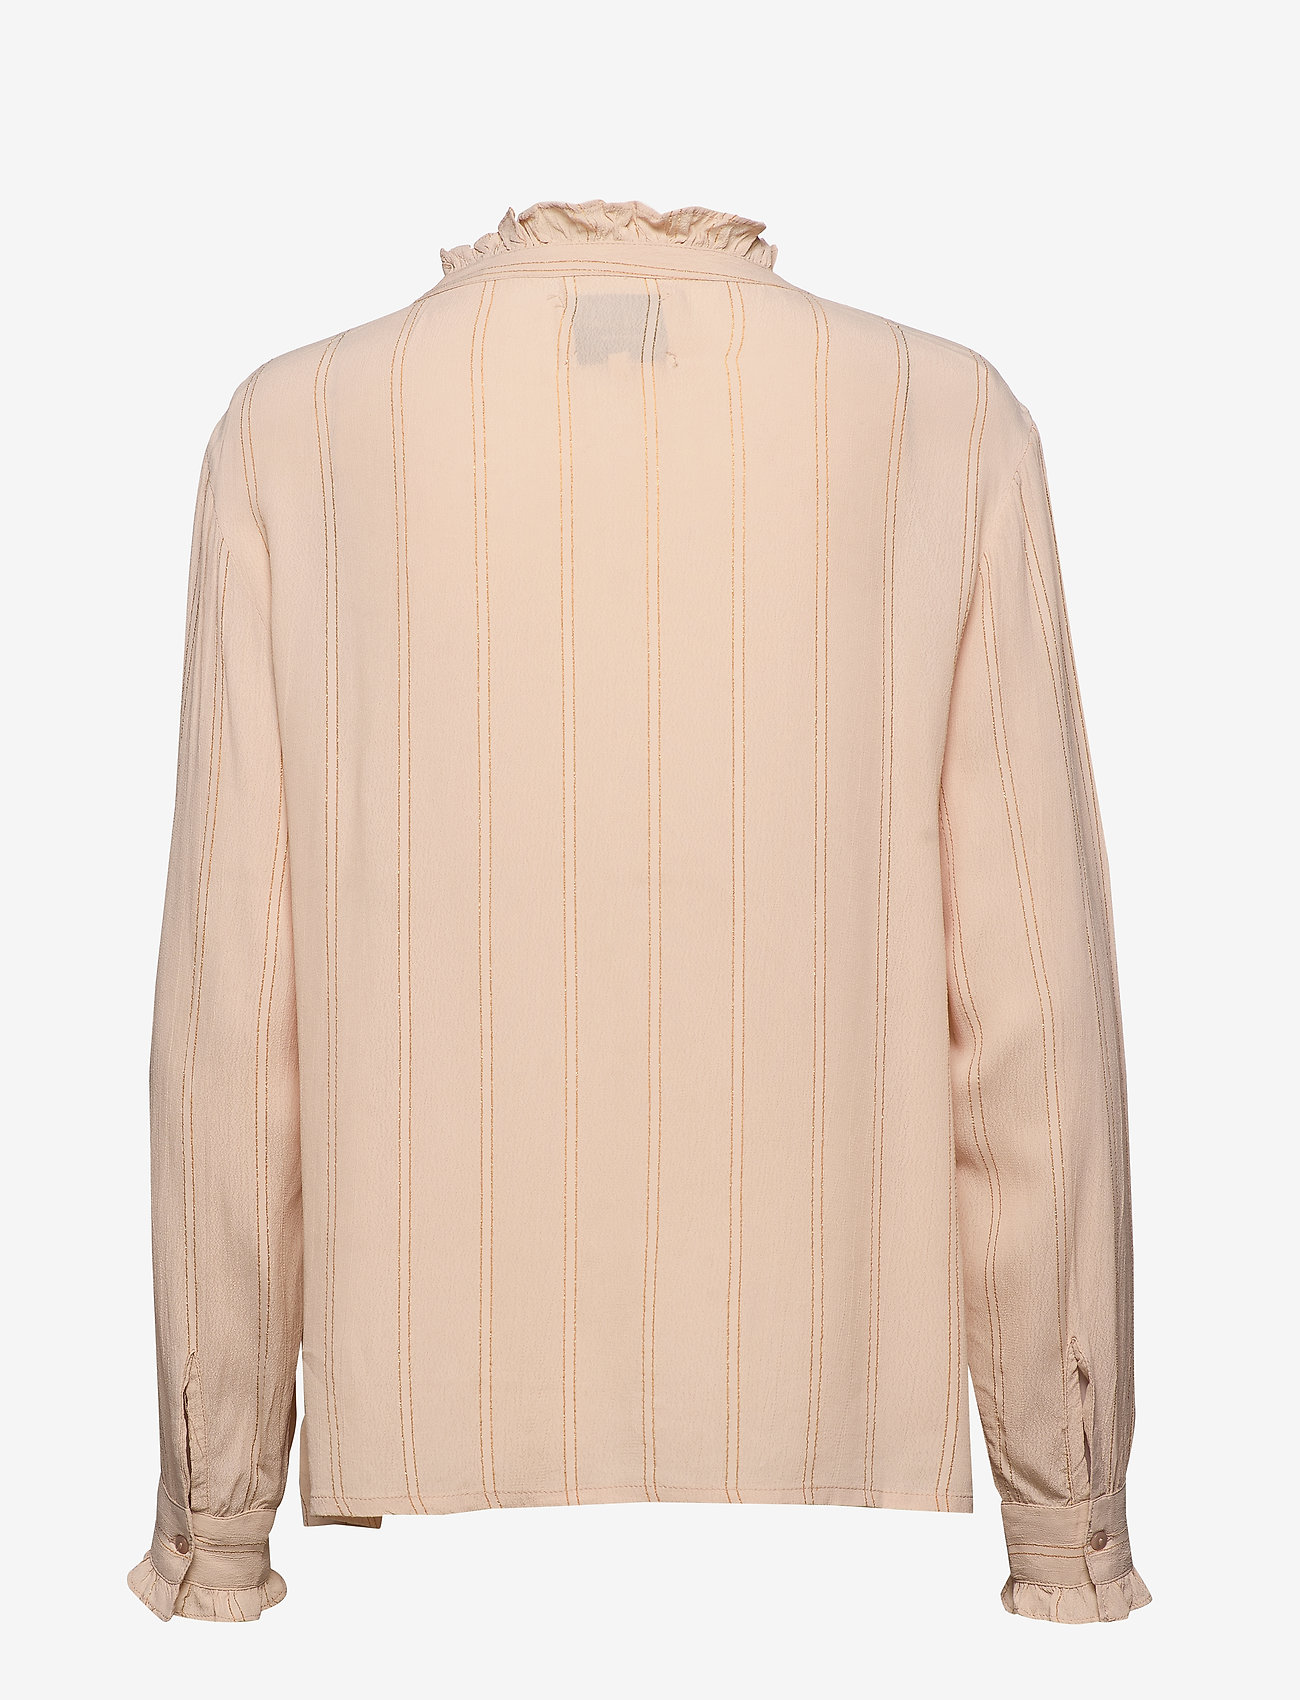 Franka Shirt (Dusty Rose) (567 kr) - Lollys Laundry